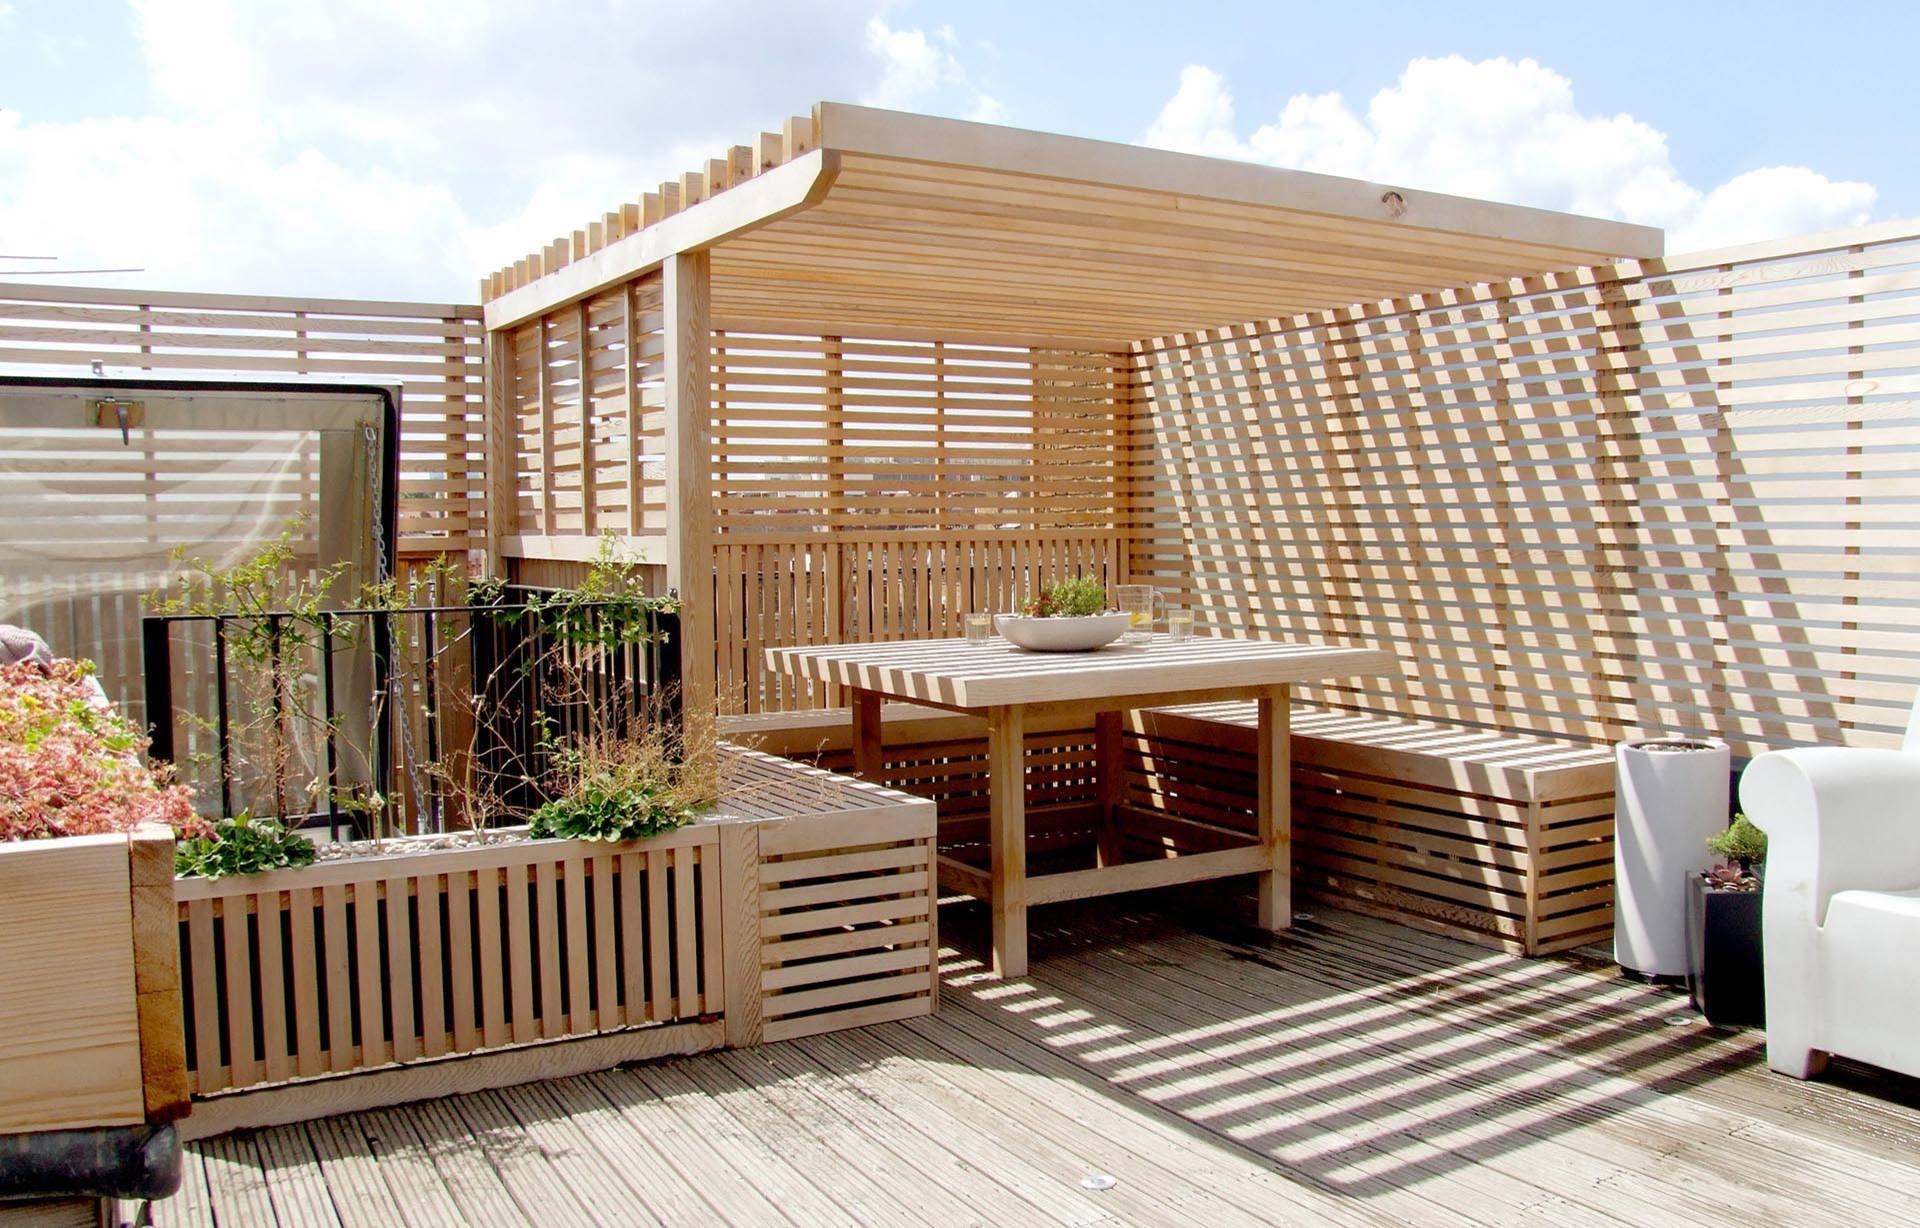 Moderne Terrassengestaltung mit Holz